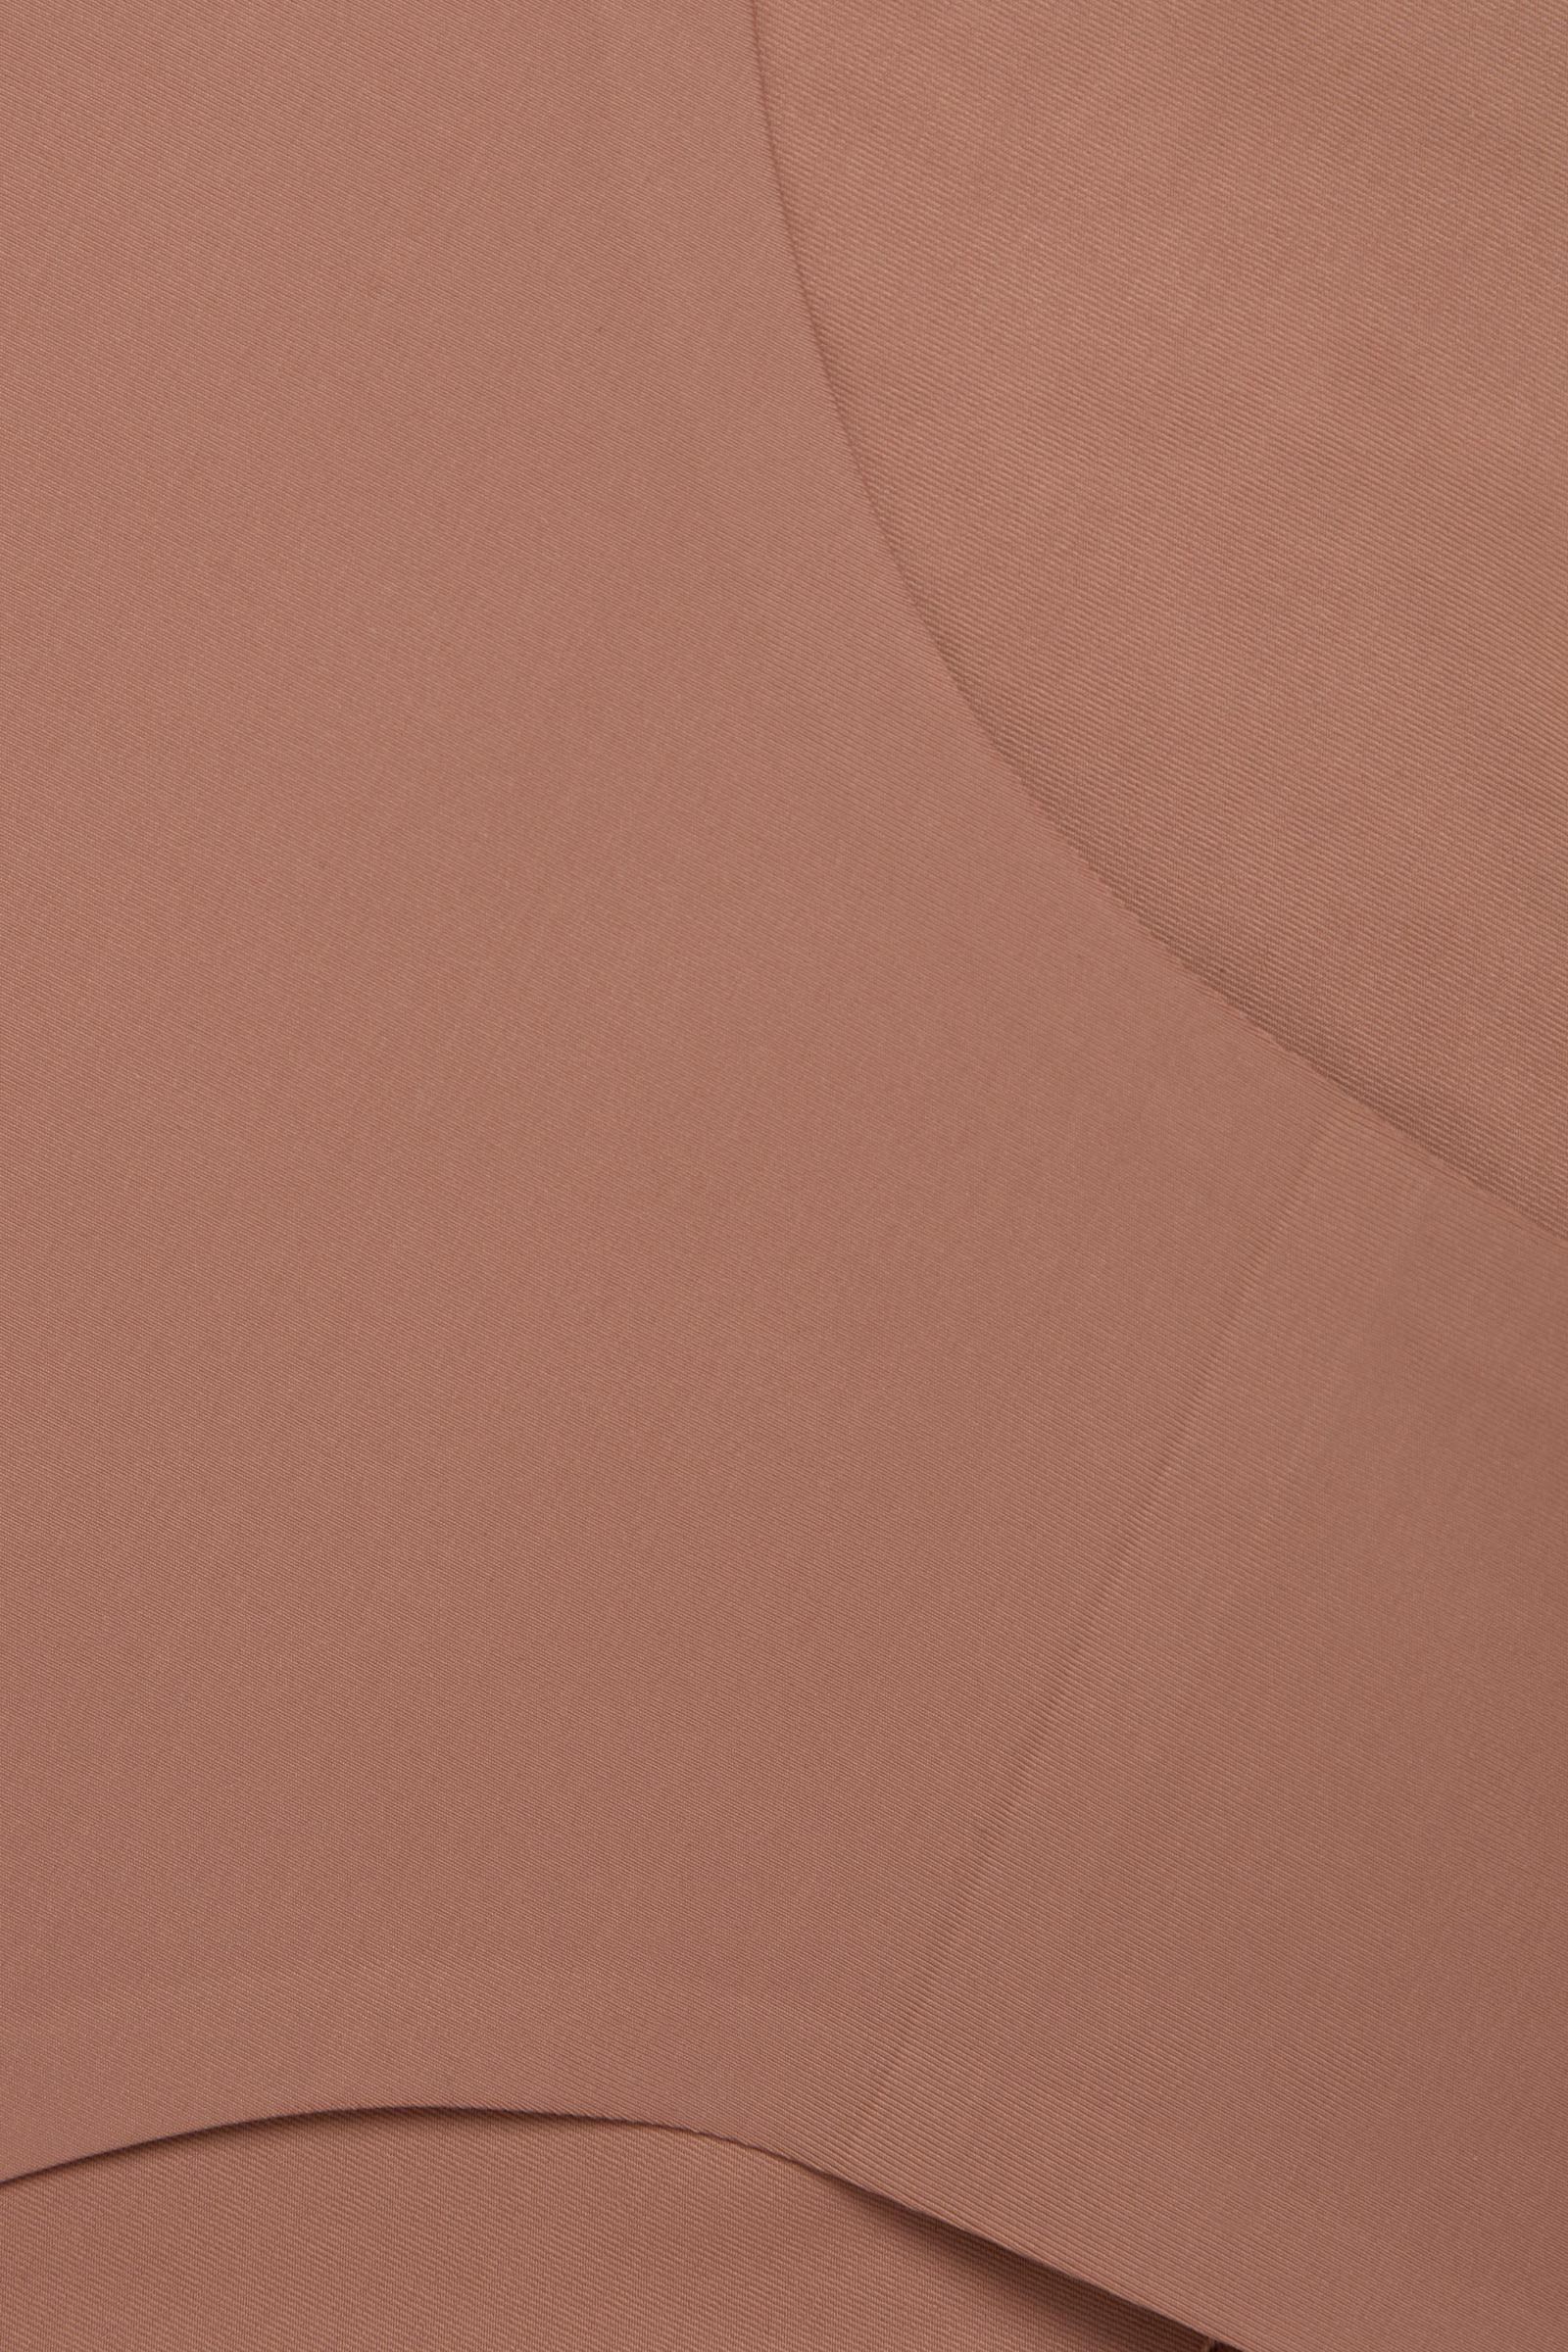 COS 컨트롤 하이 웨이스트 리사이클 나일론 브리프의 쉐이드 319컬러 Detail입니다.